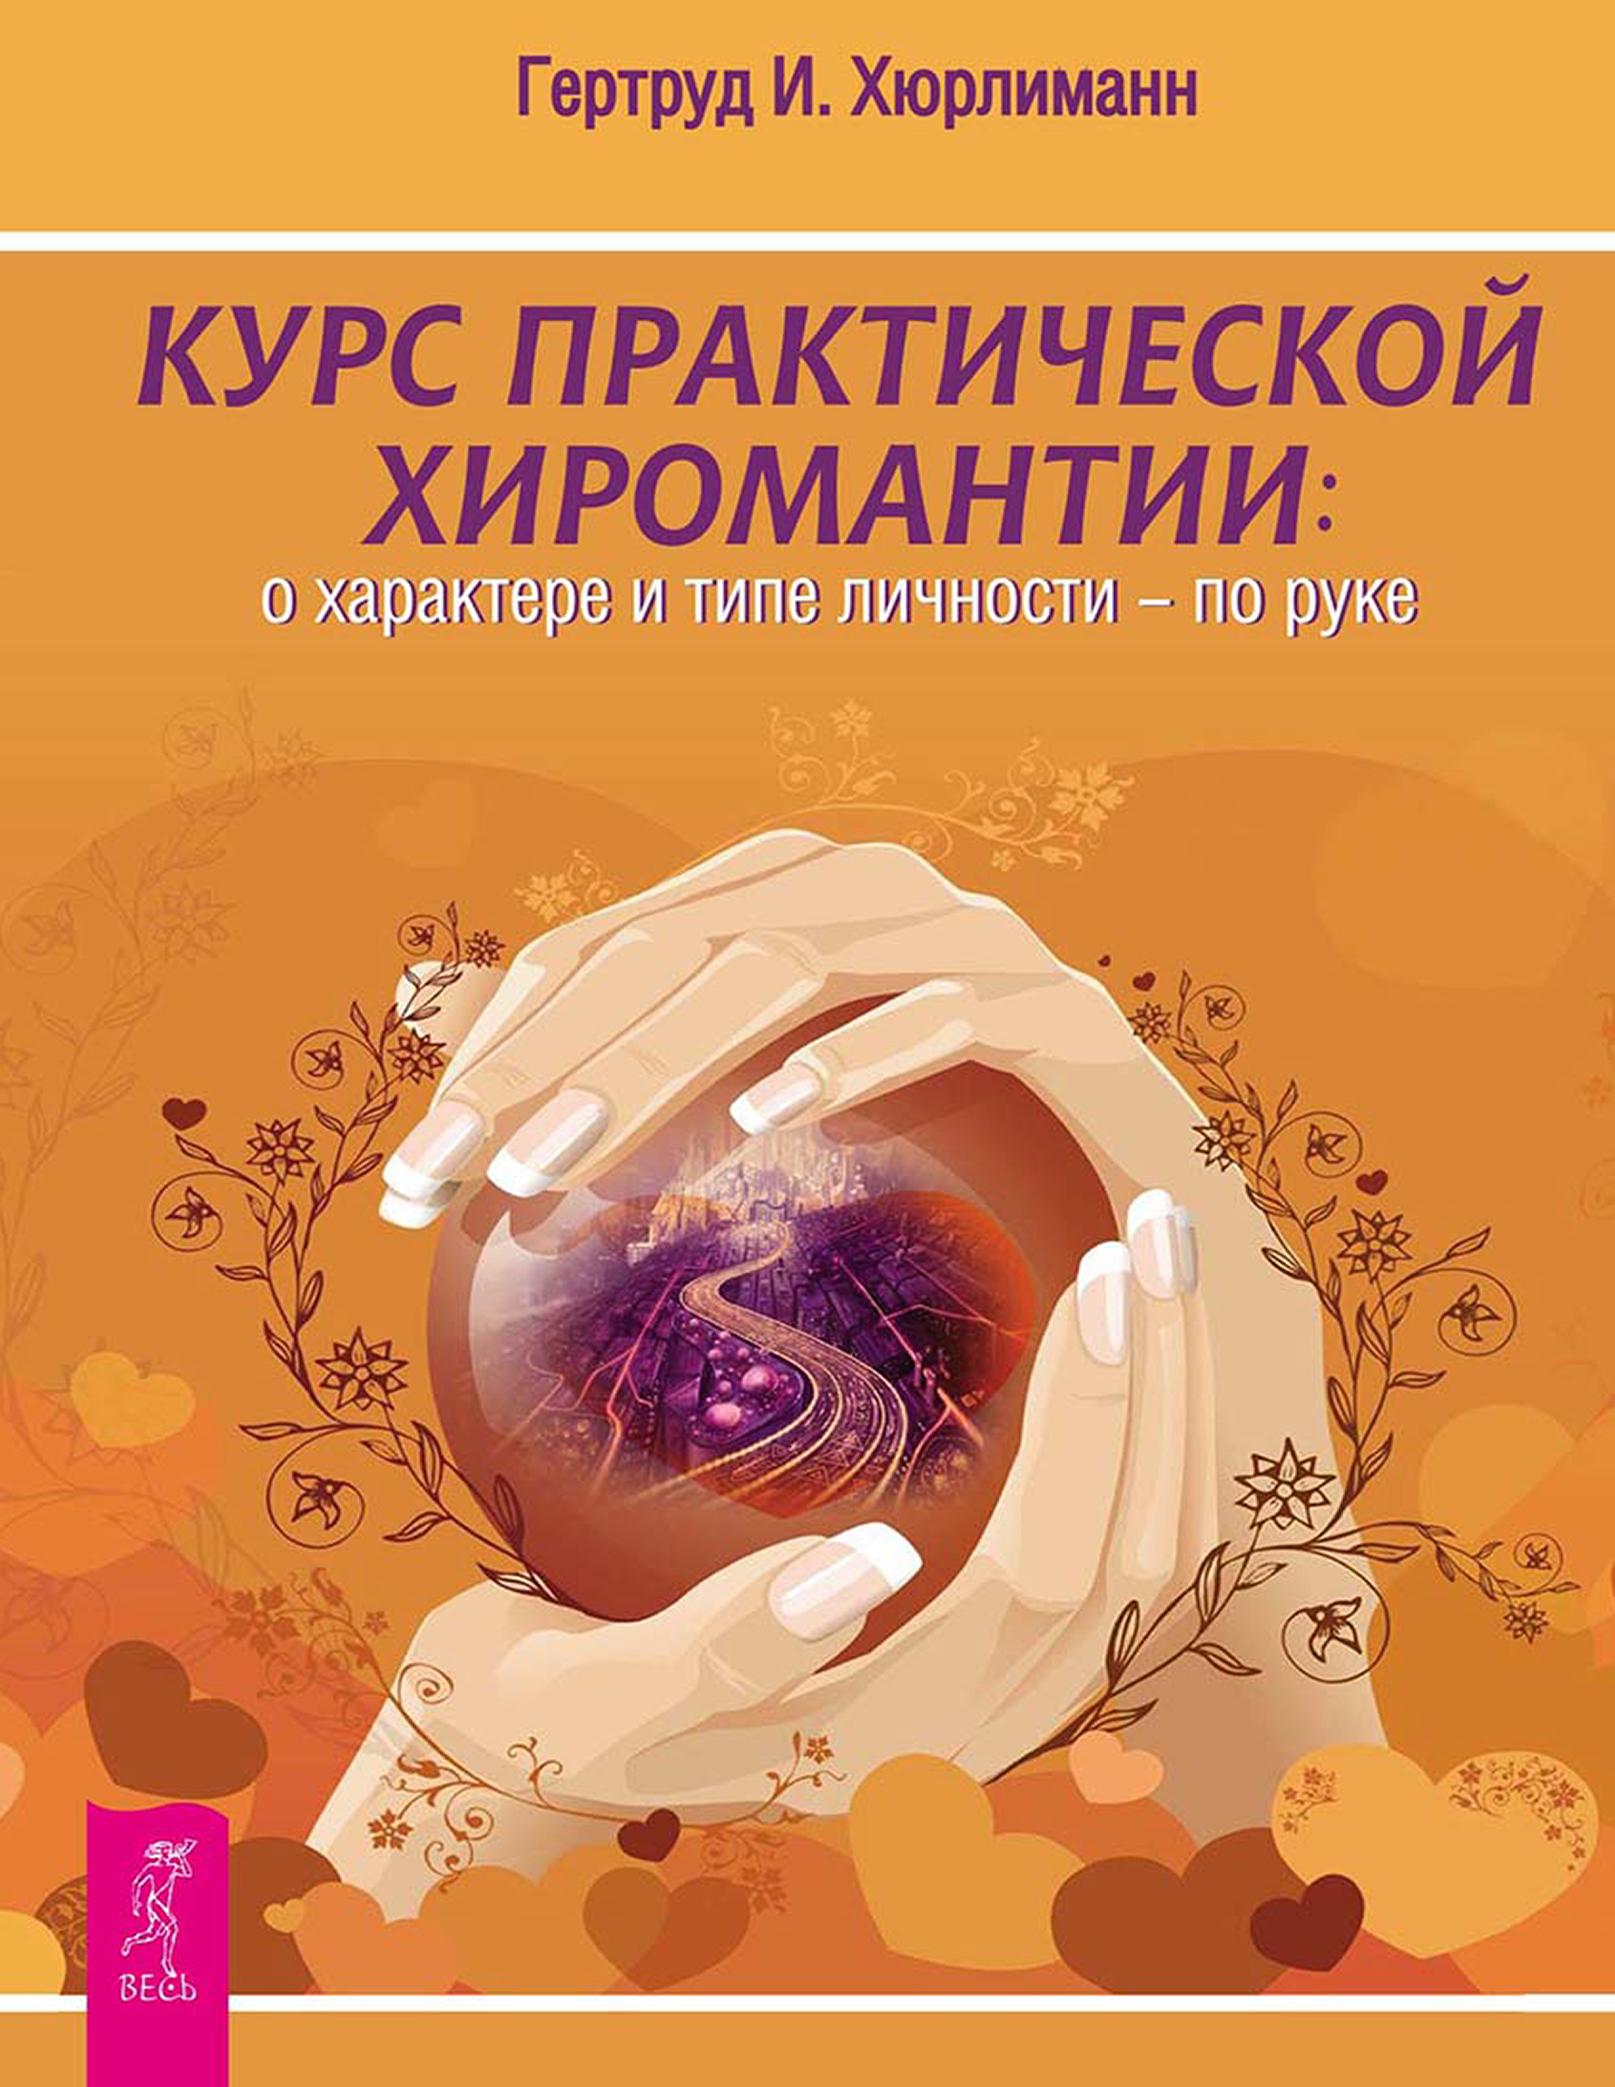 Гердтруд И. Хюрлиманн Курс практической хиромантии: о характере и типе личности по руке цены онлайн